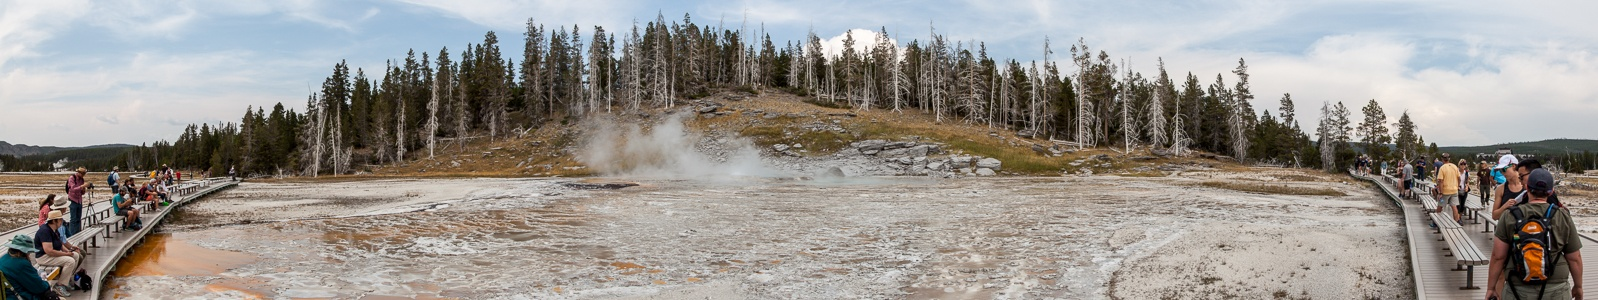 Yellowstone National Park Upper Geyser Basin: Grand Geyser